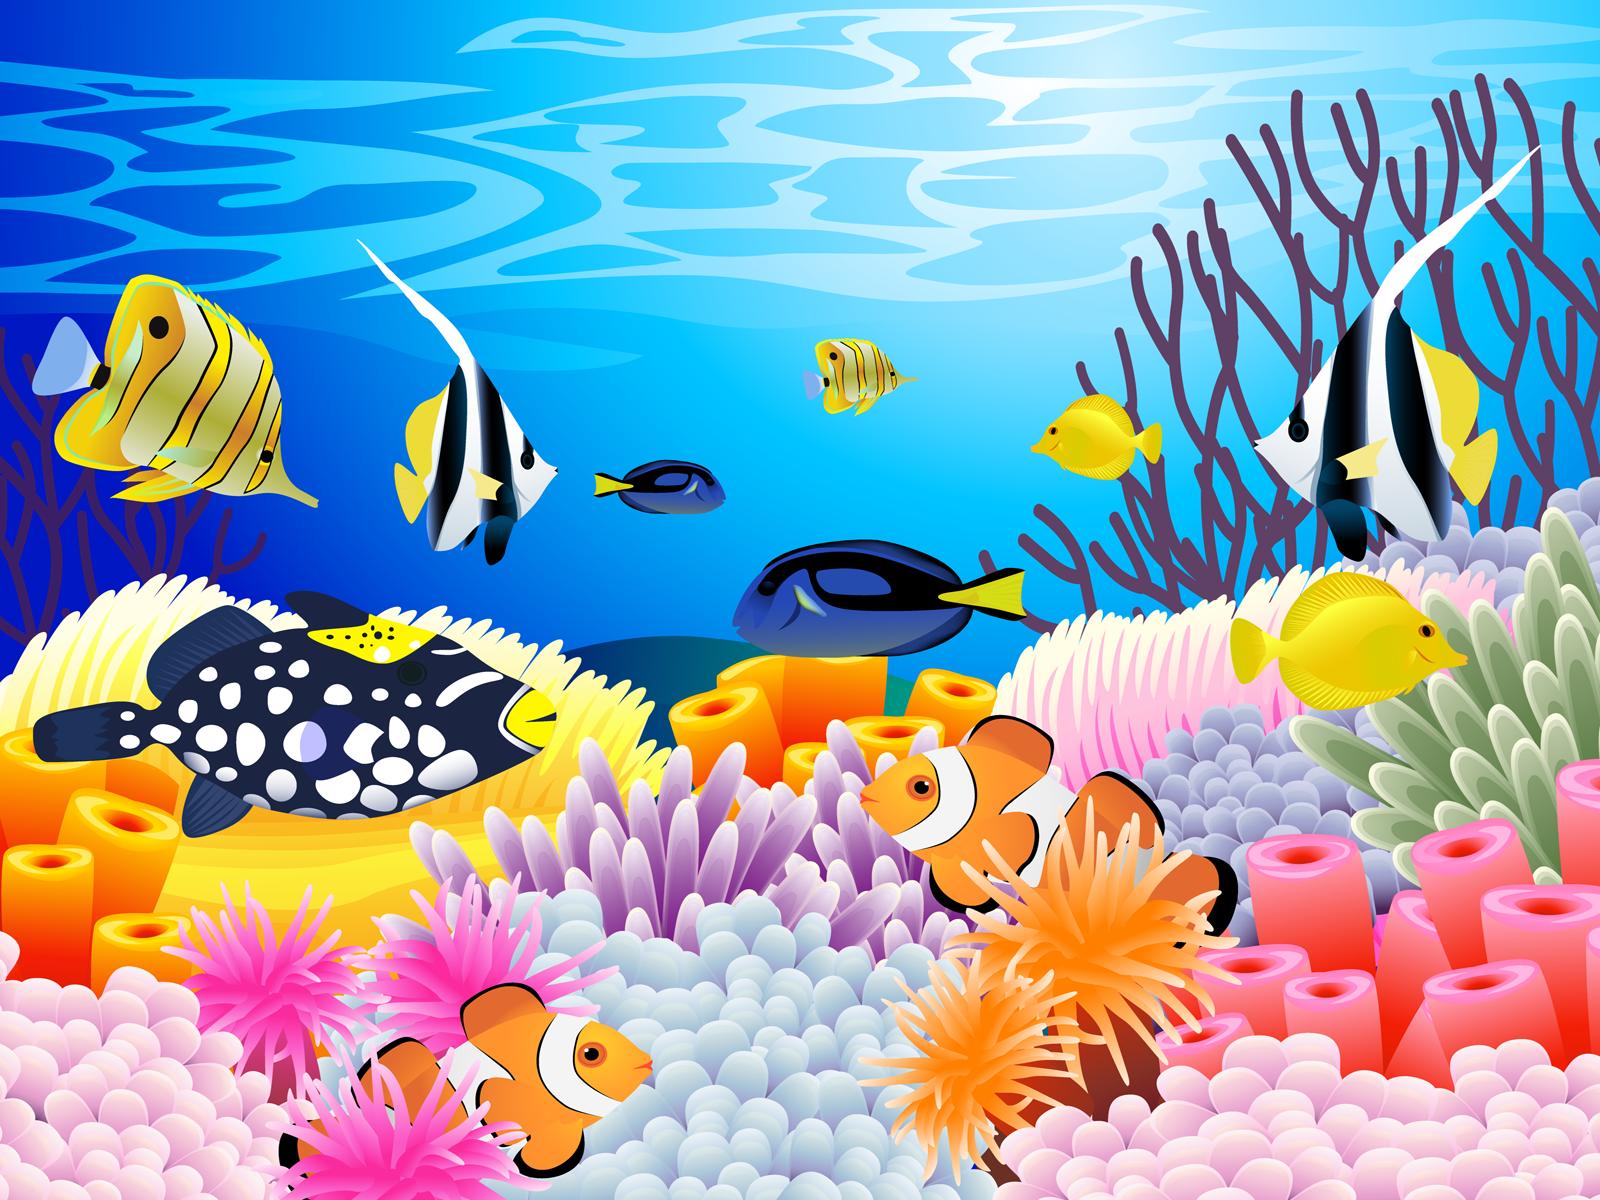 Undersea picture of colorful. Ocean clipart underwater